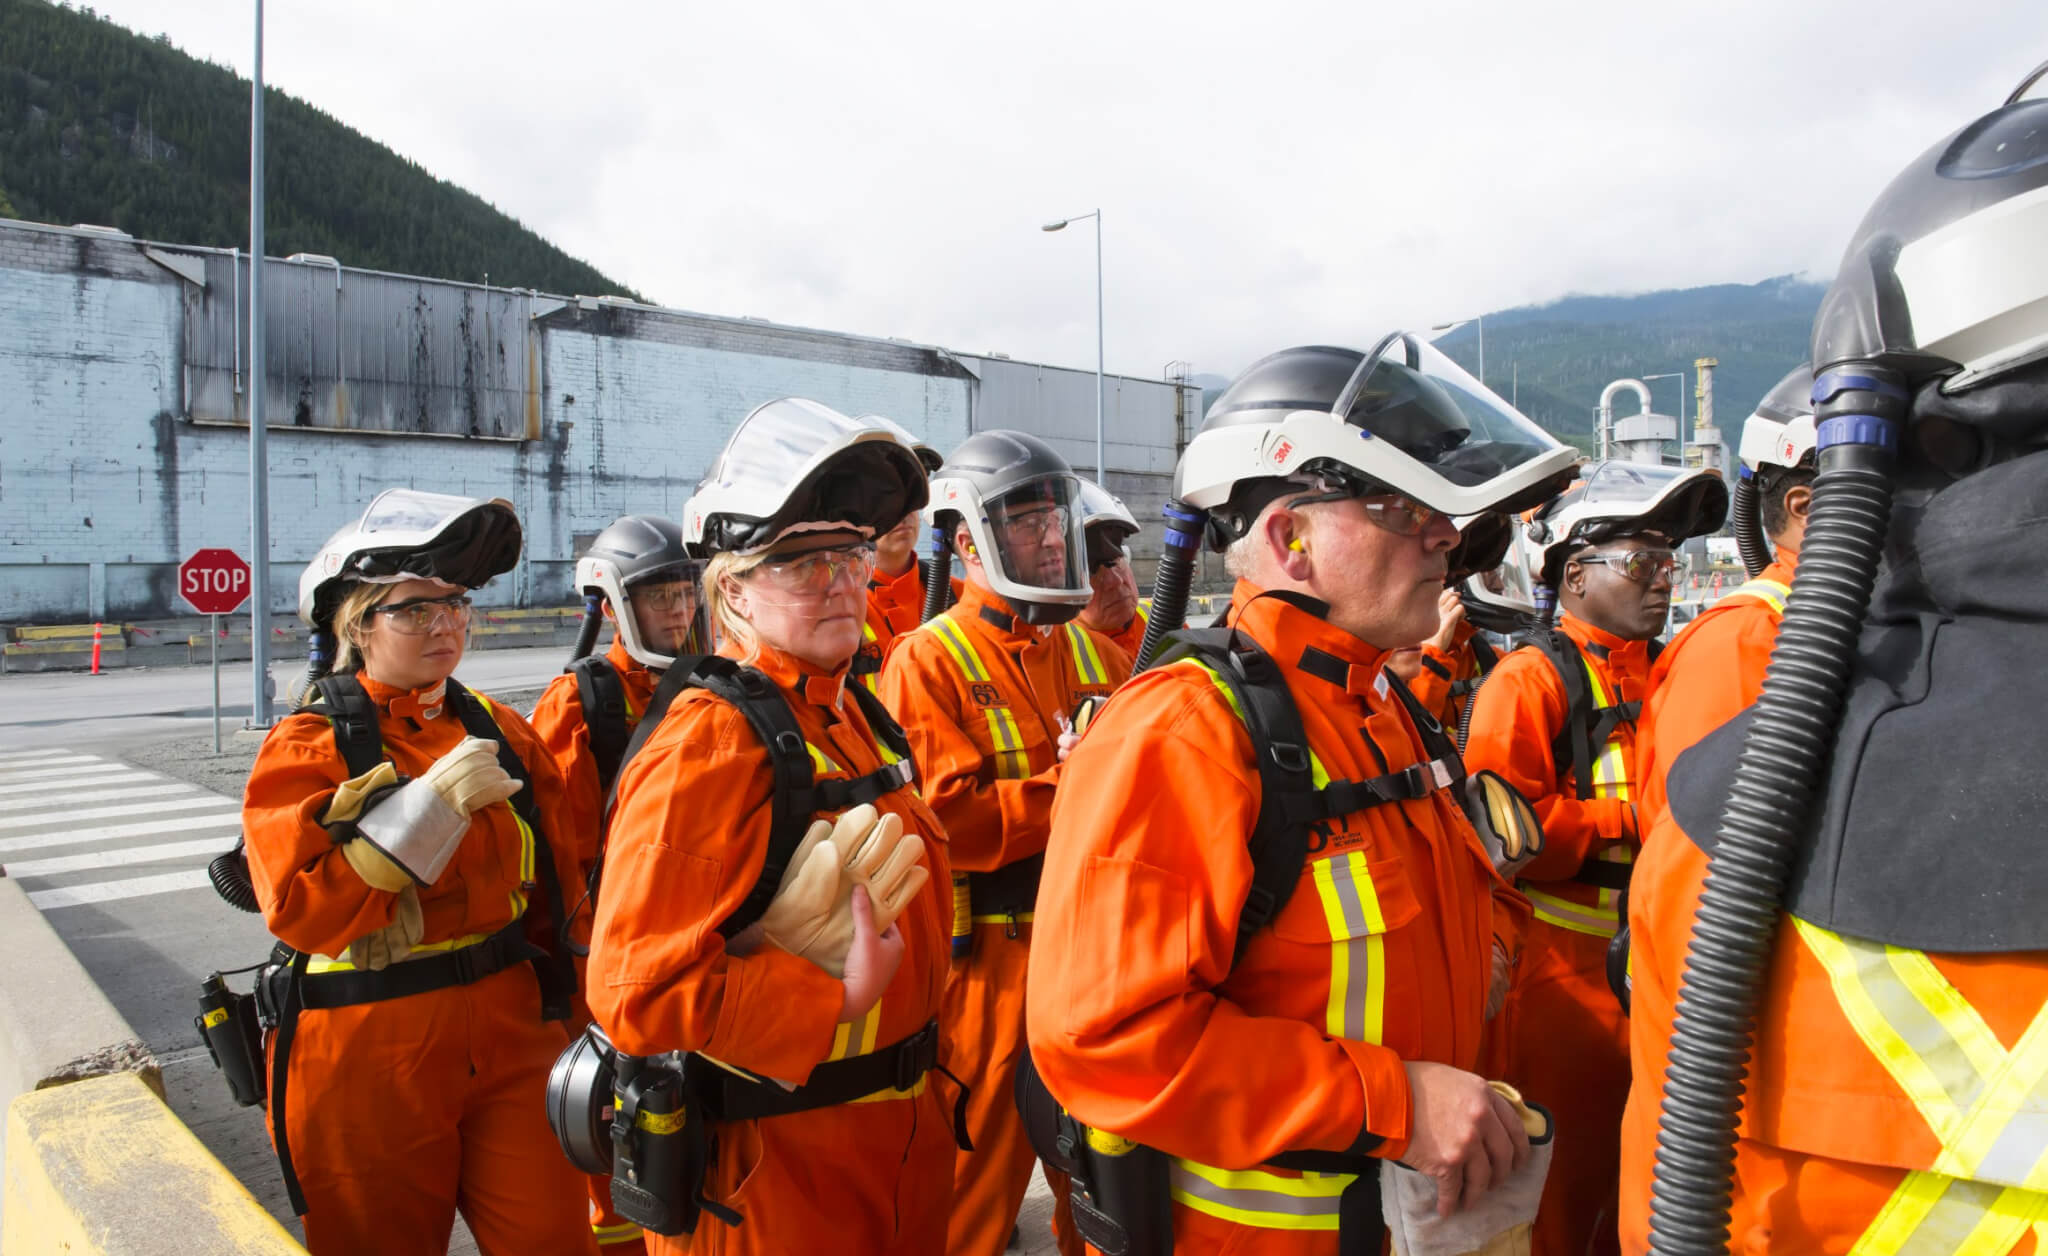 CABC board members tour the Rio Tinto facility in Kitimat, BC